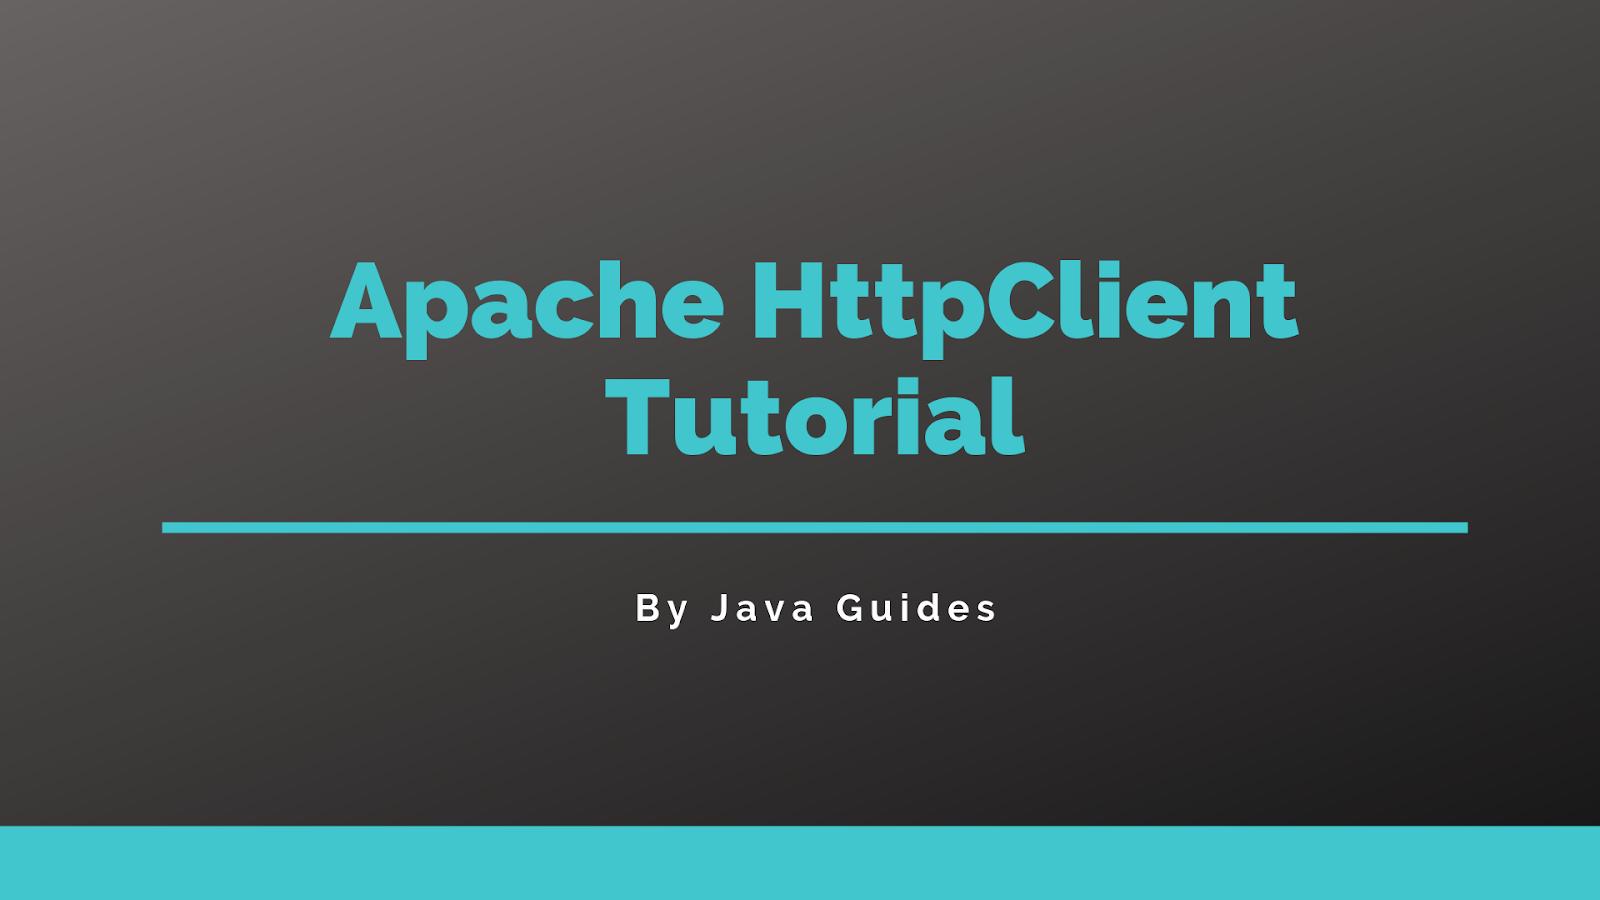 Apache HttpClient Tutorial